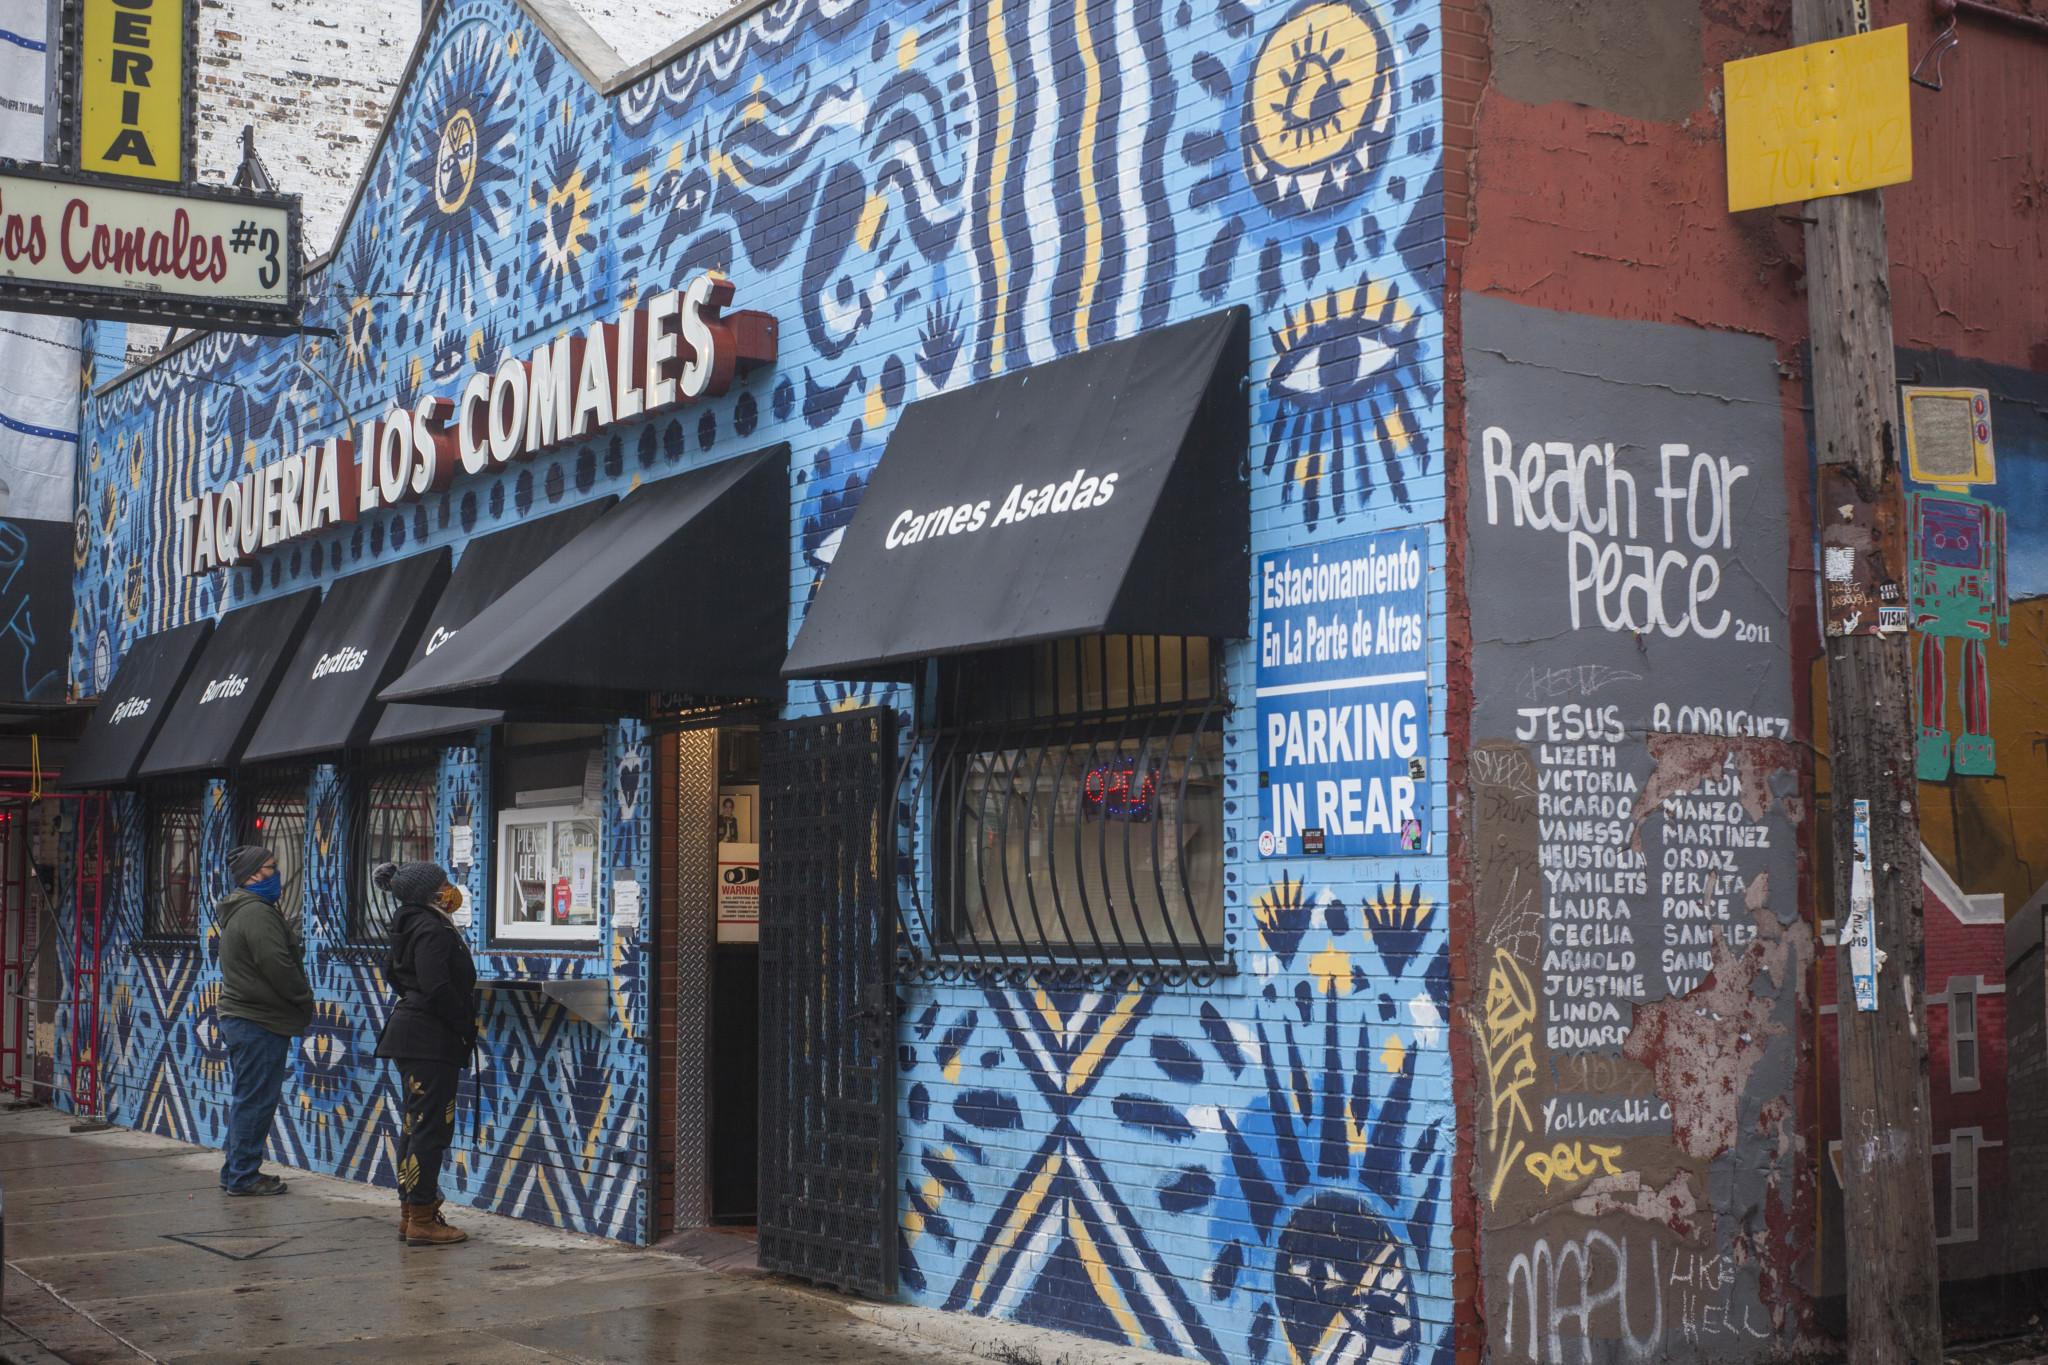 Los Comales. Photo Credit: Gerri Fernandez